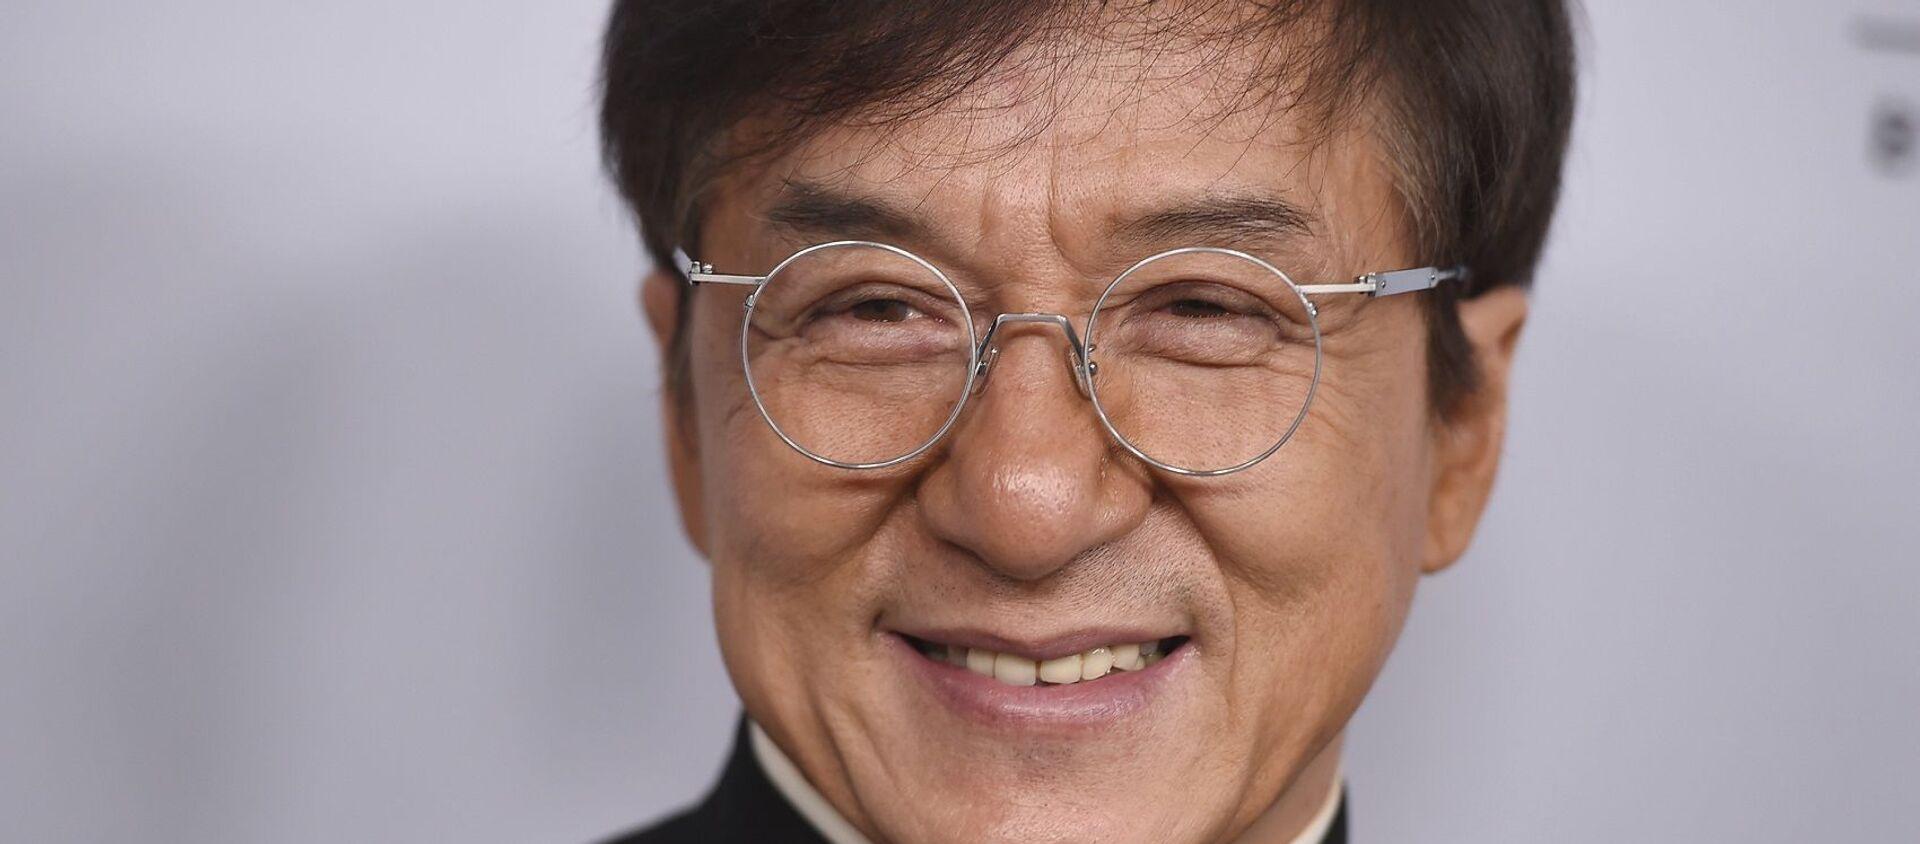 El actor Jackie Chan - Sputnik Mundo, 1920, 25.02.2020